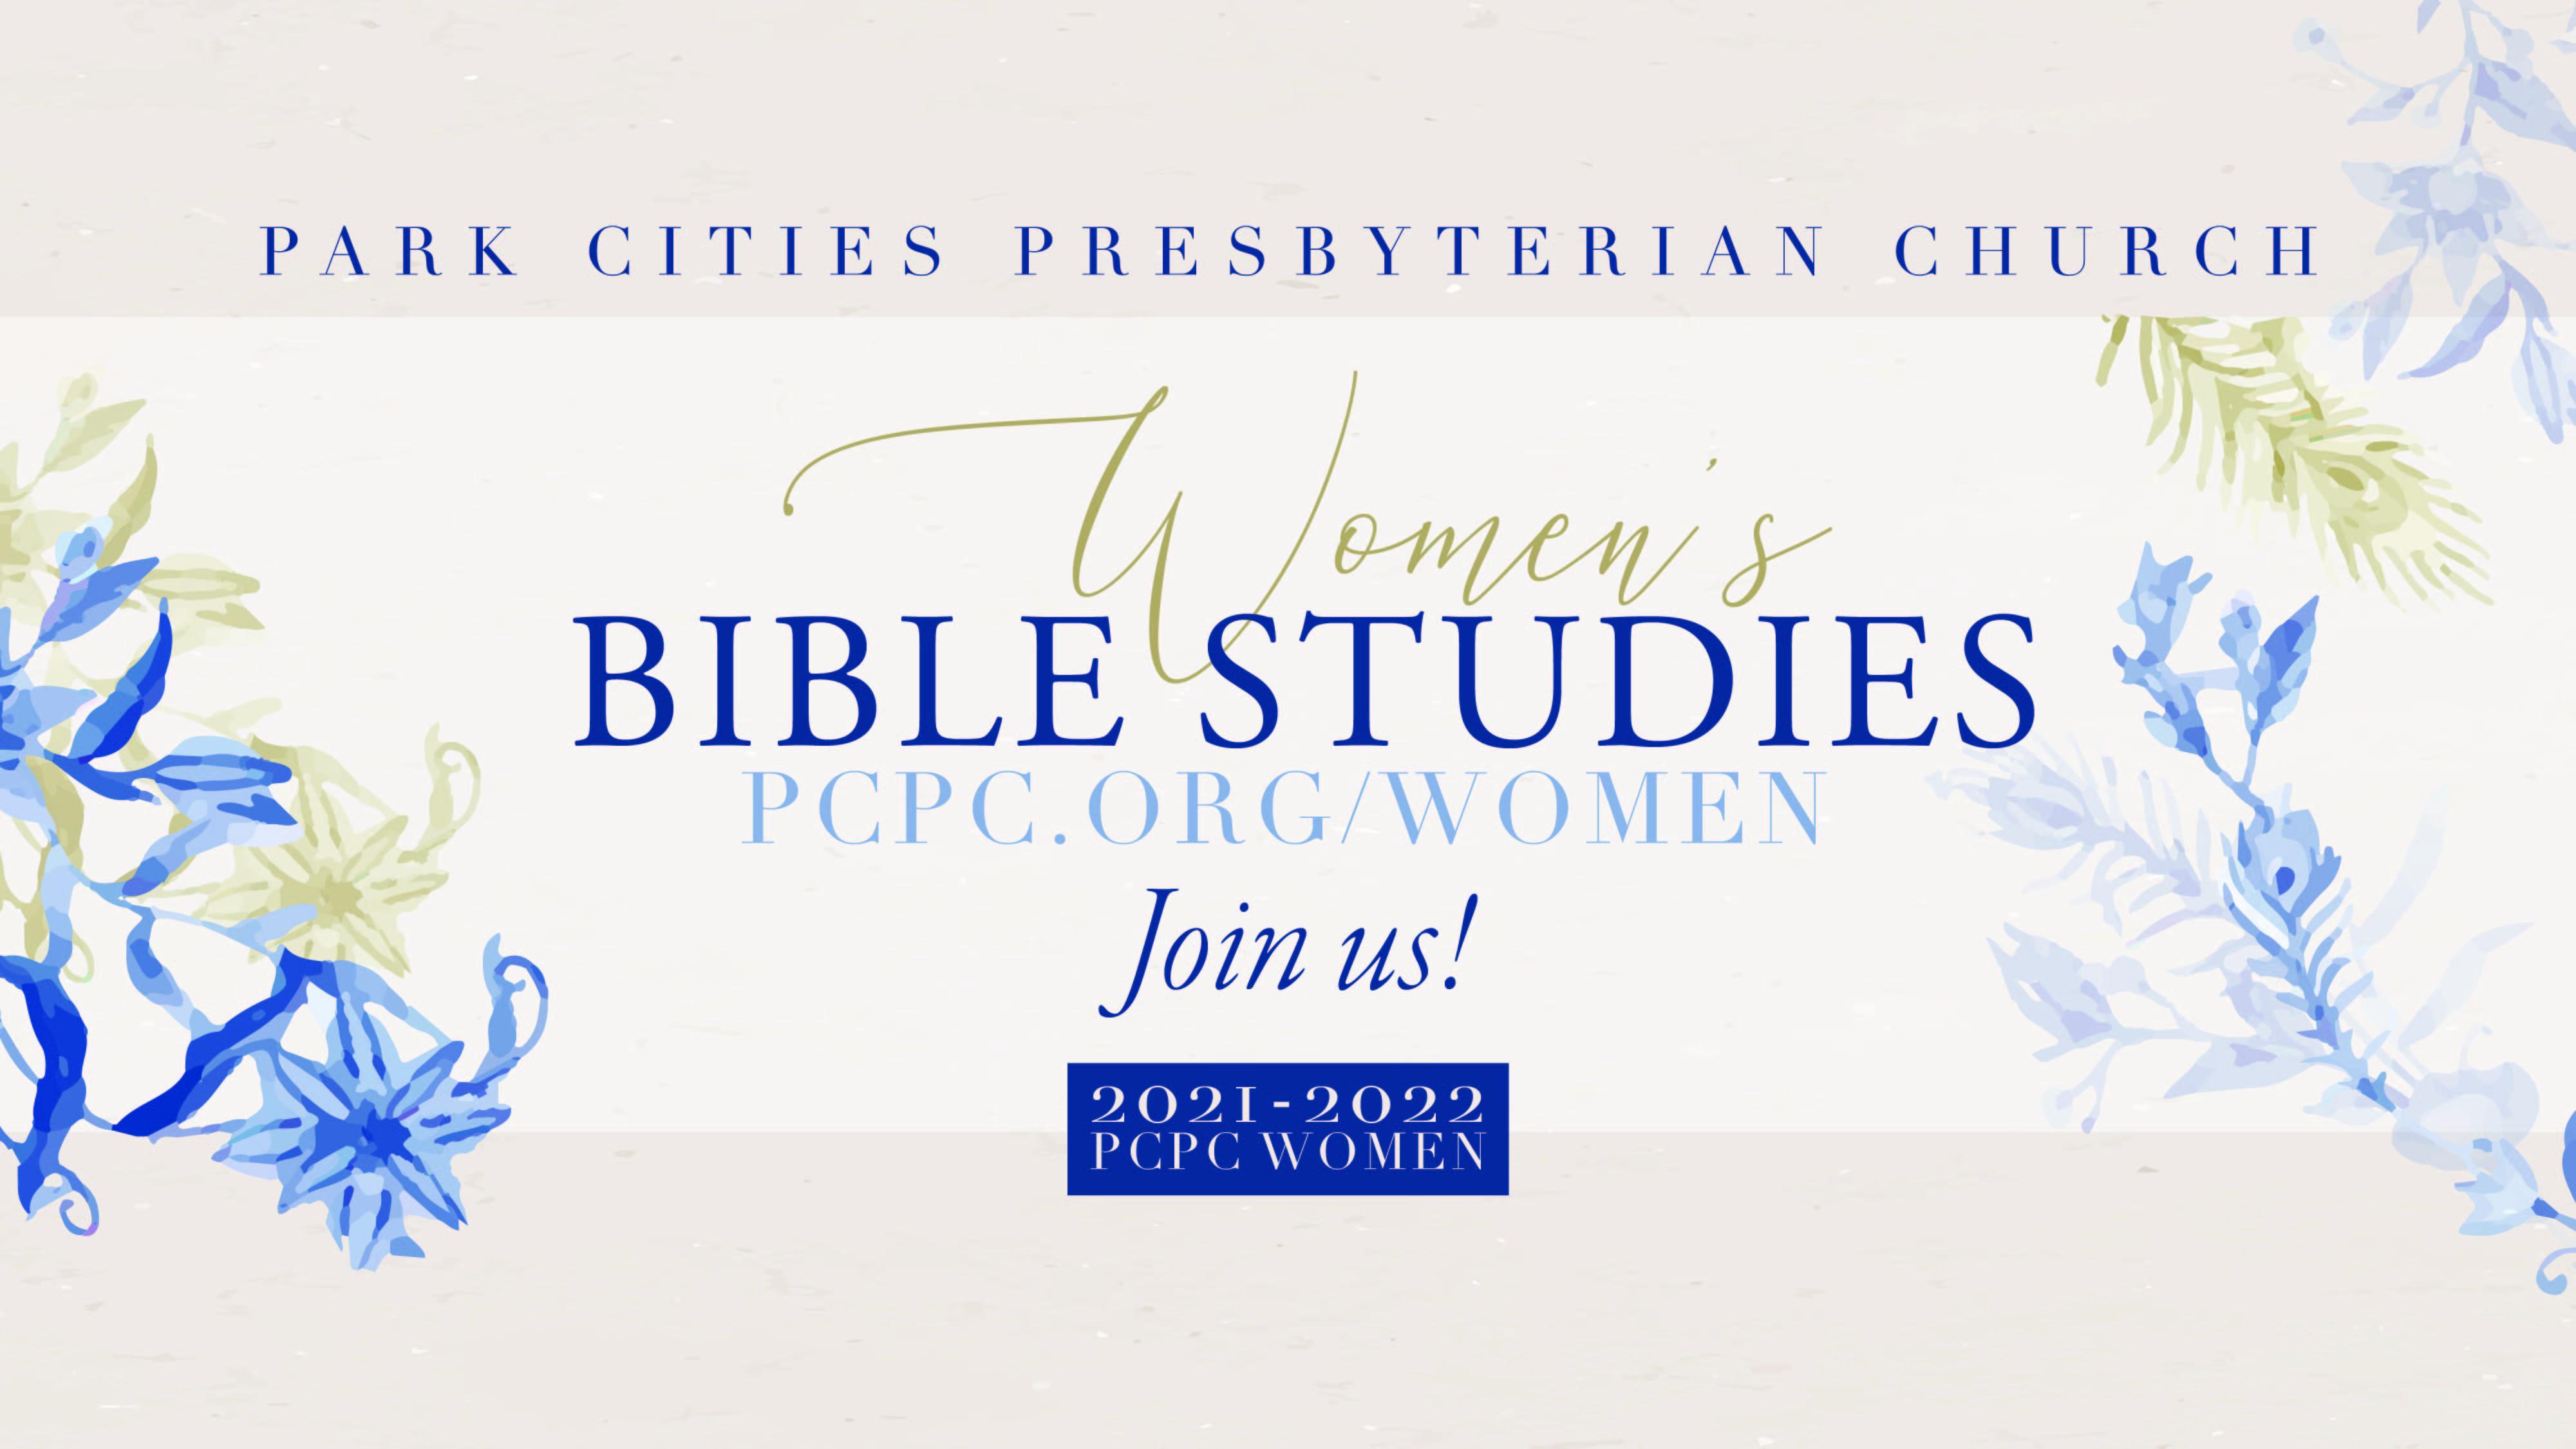 2021 Bible Studies